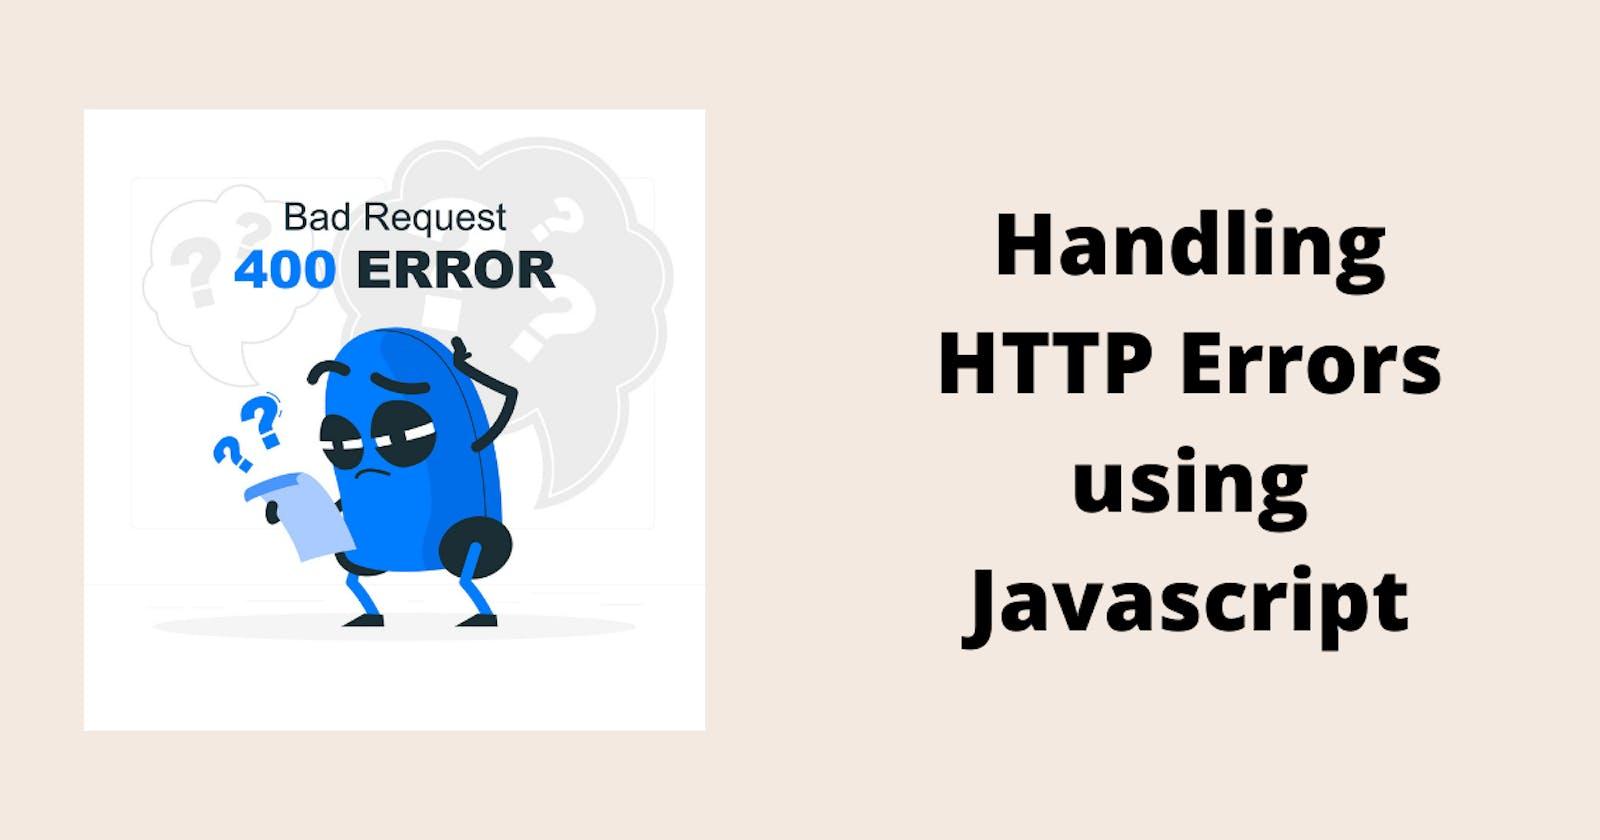 Handling HTTP Errors using Javascript